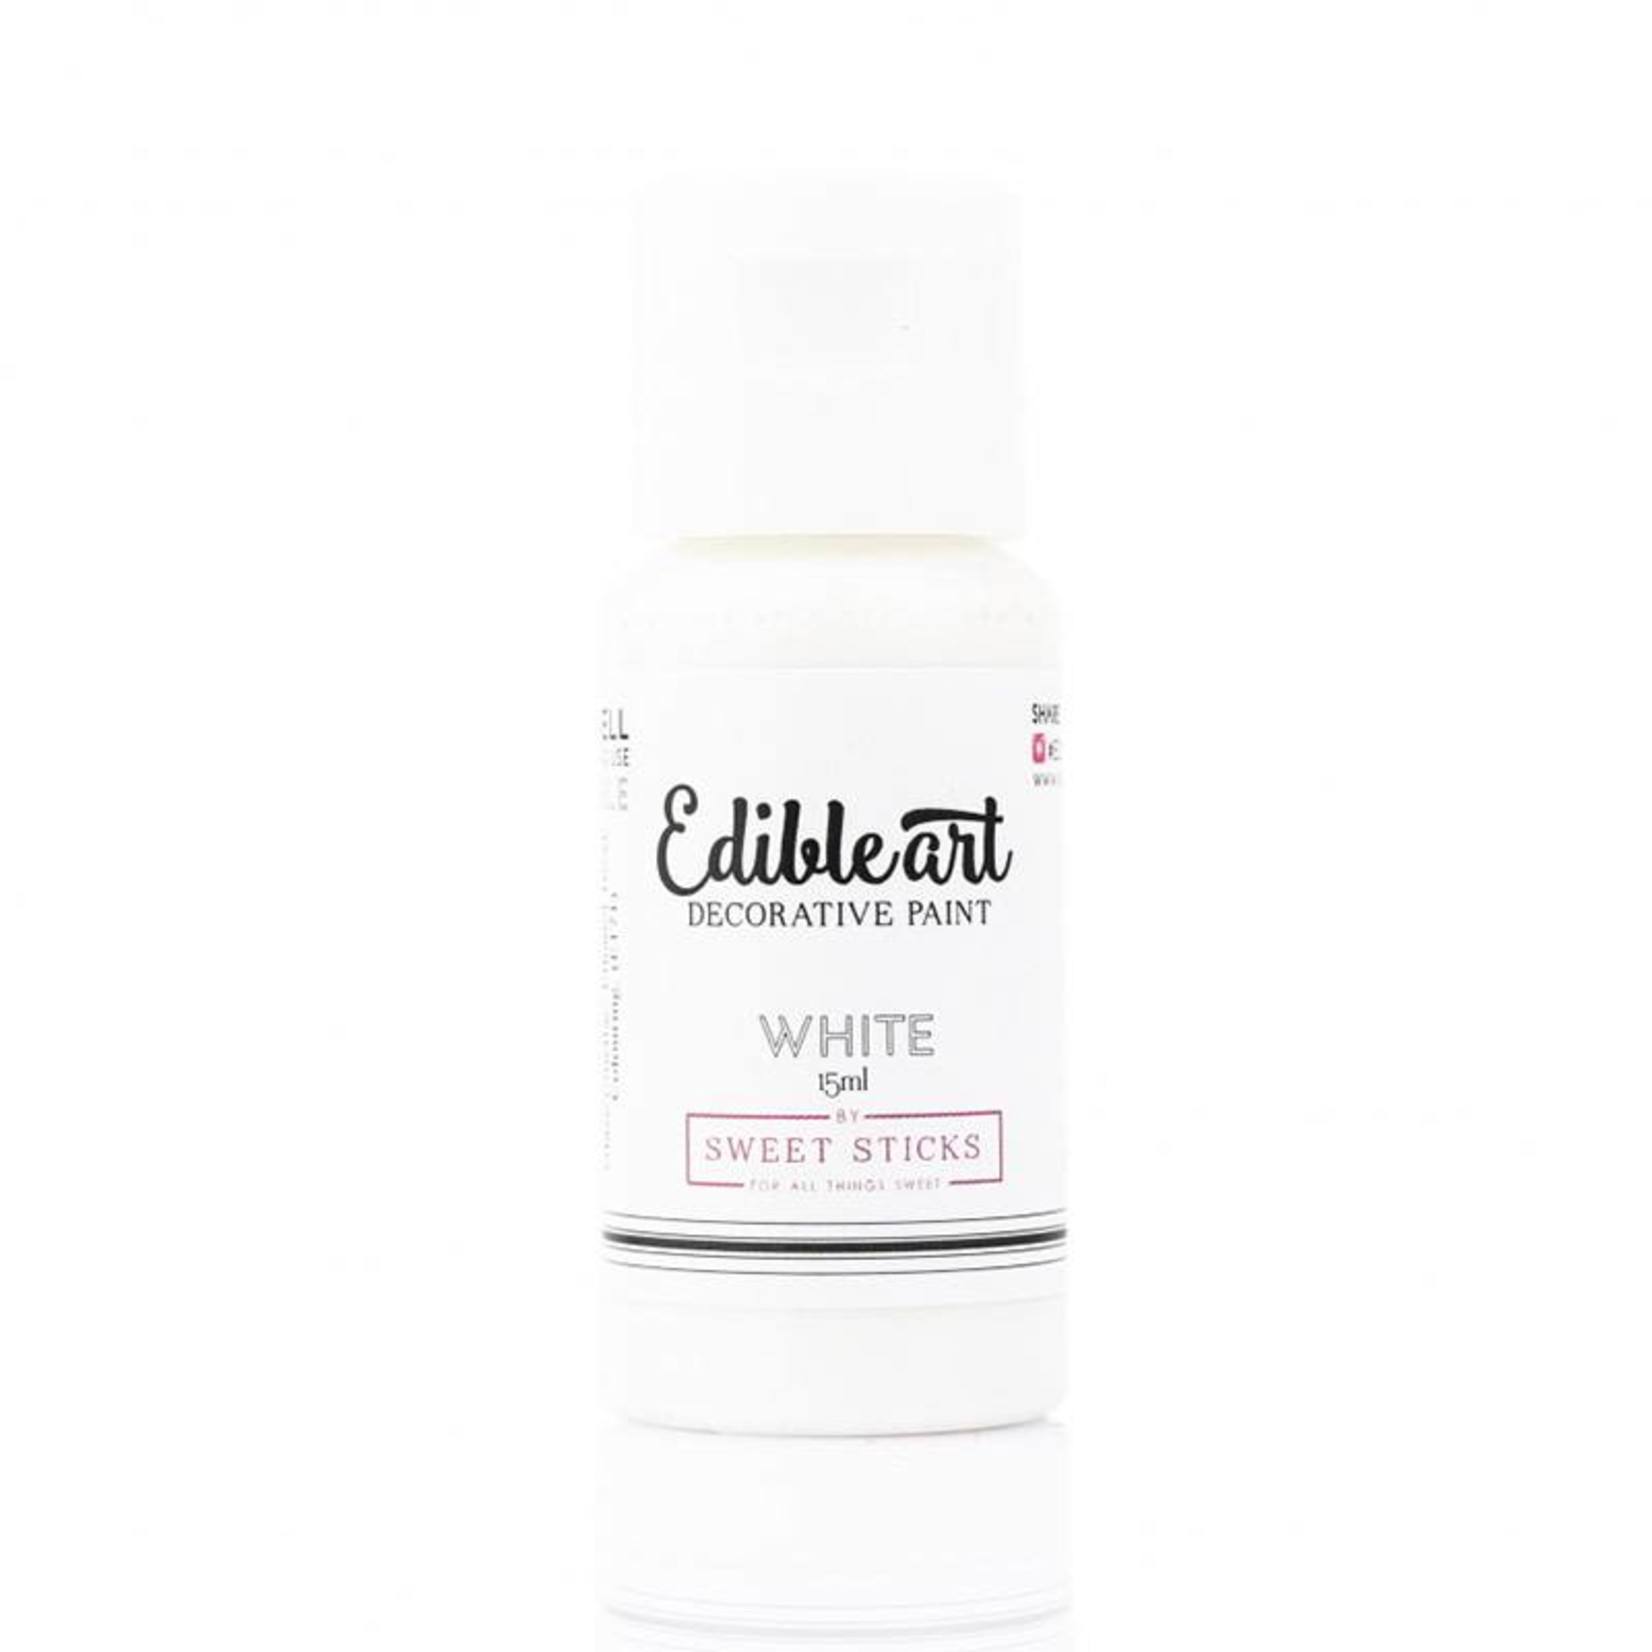 Sweet Sticks Sweet Sticks - White Edible Art Paint - 15mL